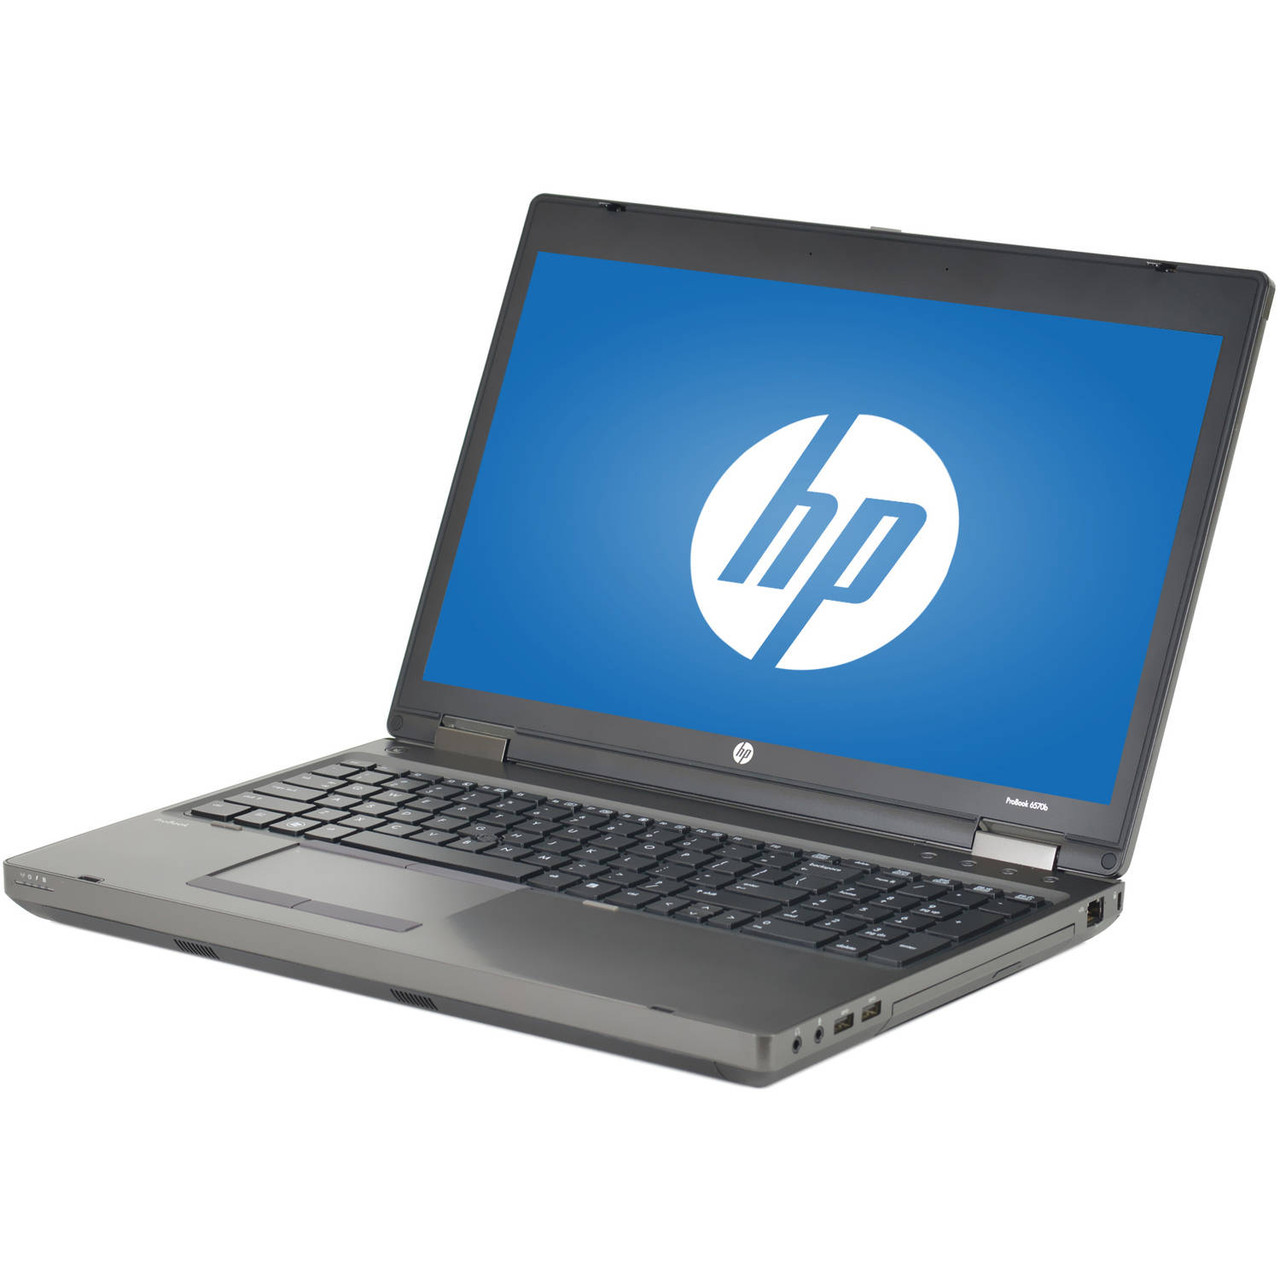 HP Compaq Probook 6570b Laptop Core i5 2.6GHz, 8GB Ram, 250GB SSD, DVD-RW, Windows 10 Pro 64 Notebook